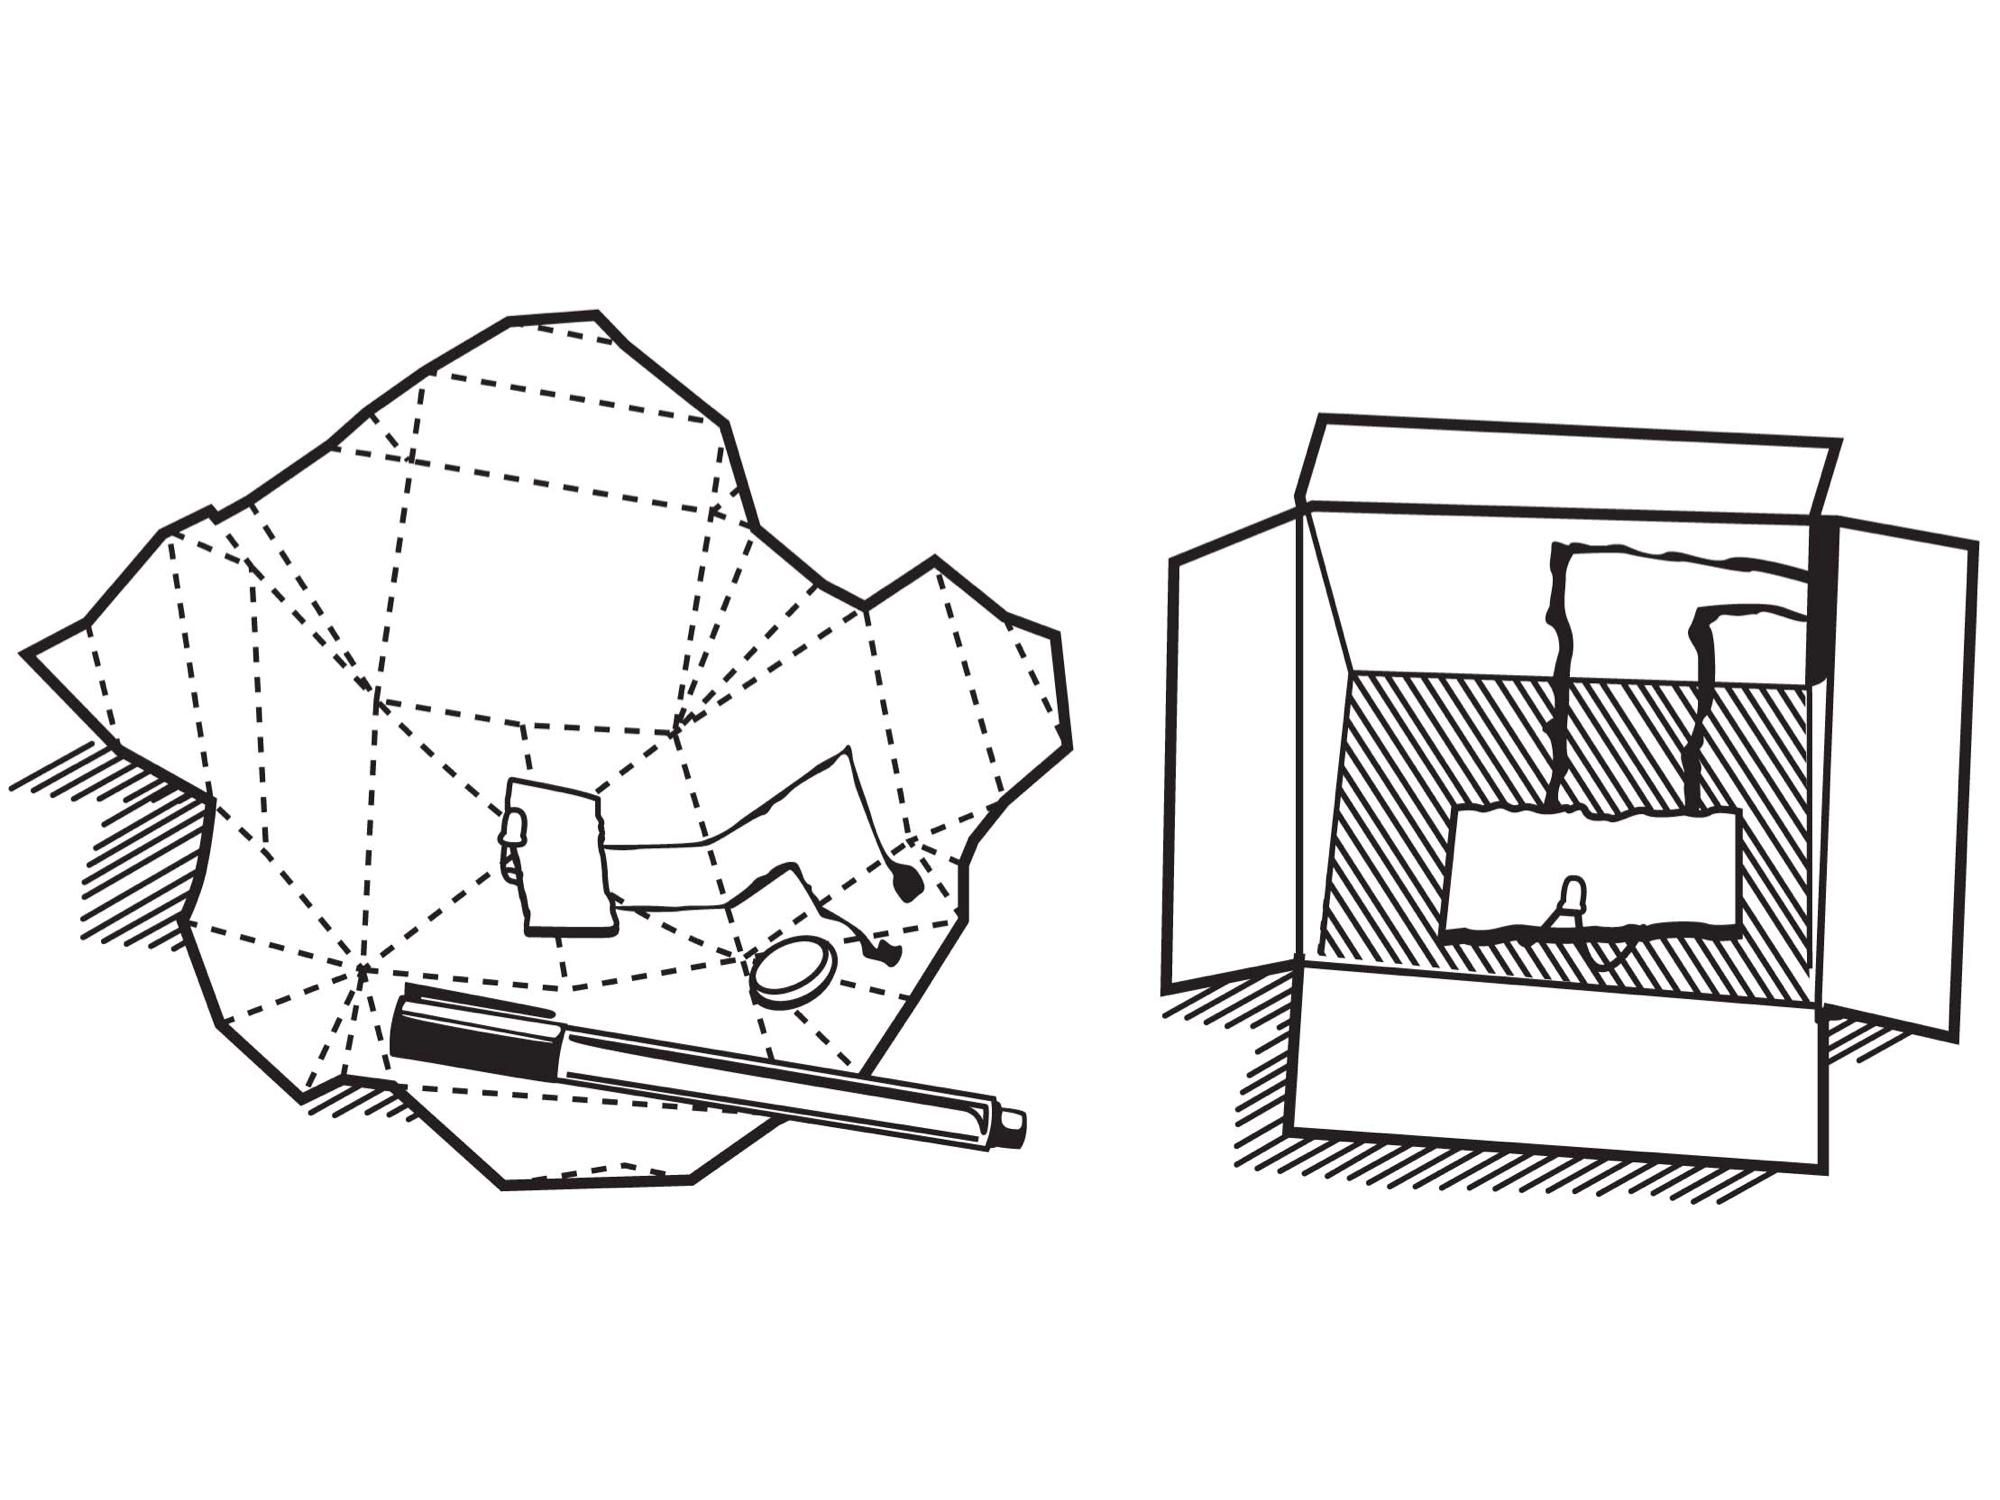 2000x1500 Electronic Origami Make